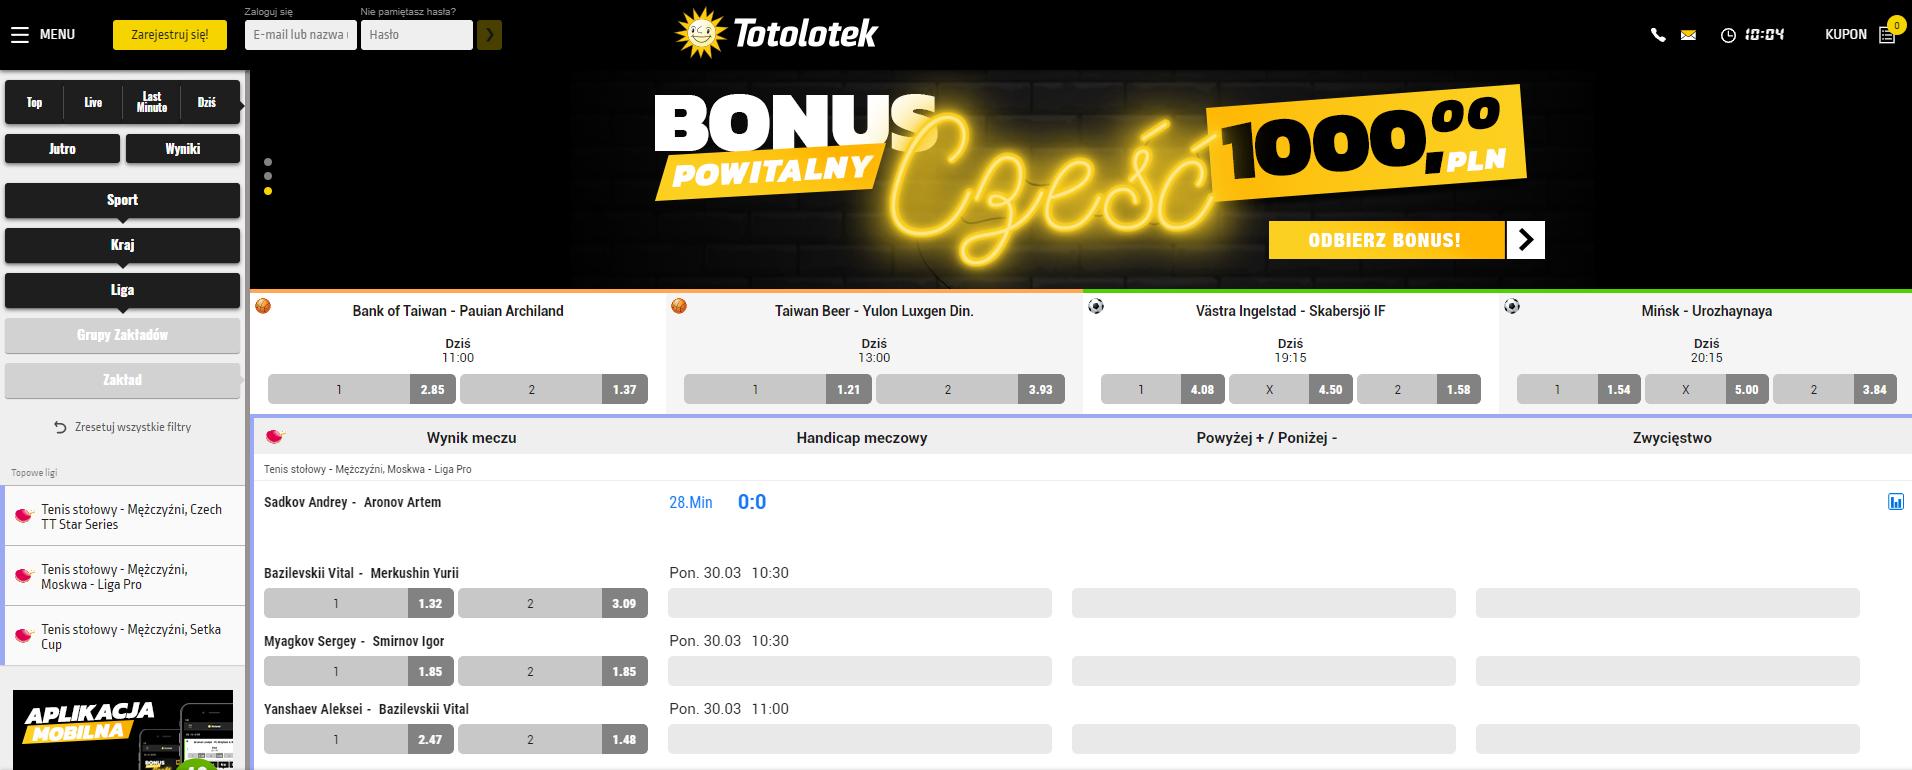 Totolotek bonusy i kod promocyjny - bonus powitalny na start